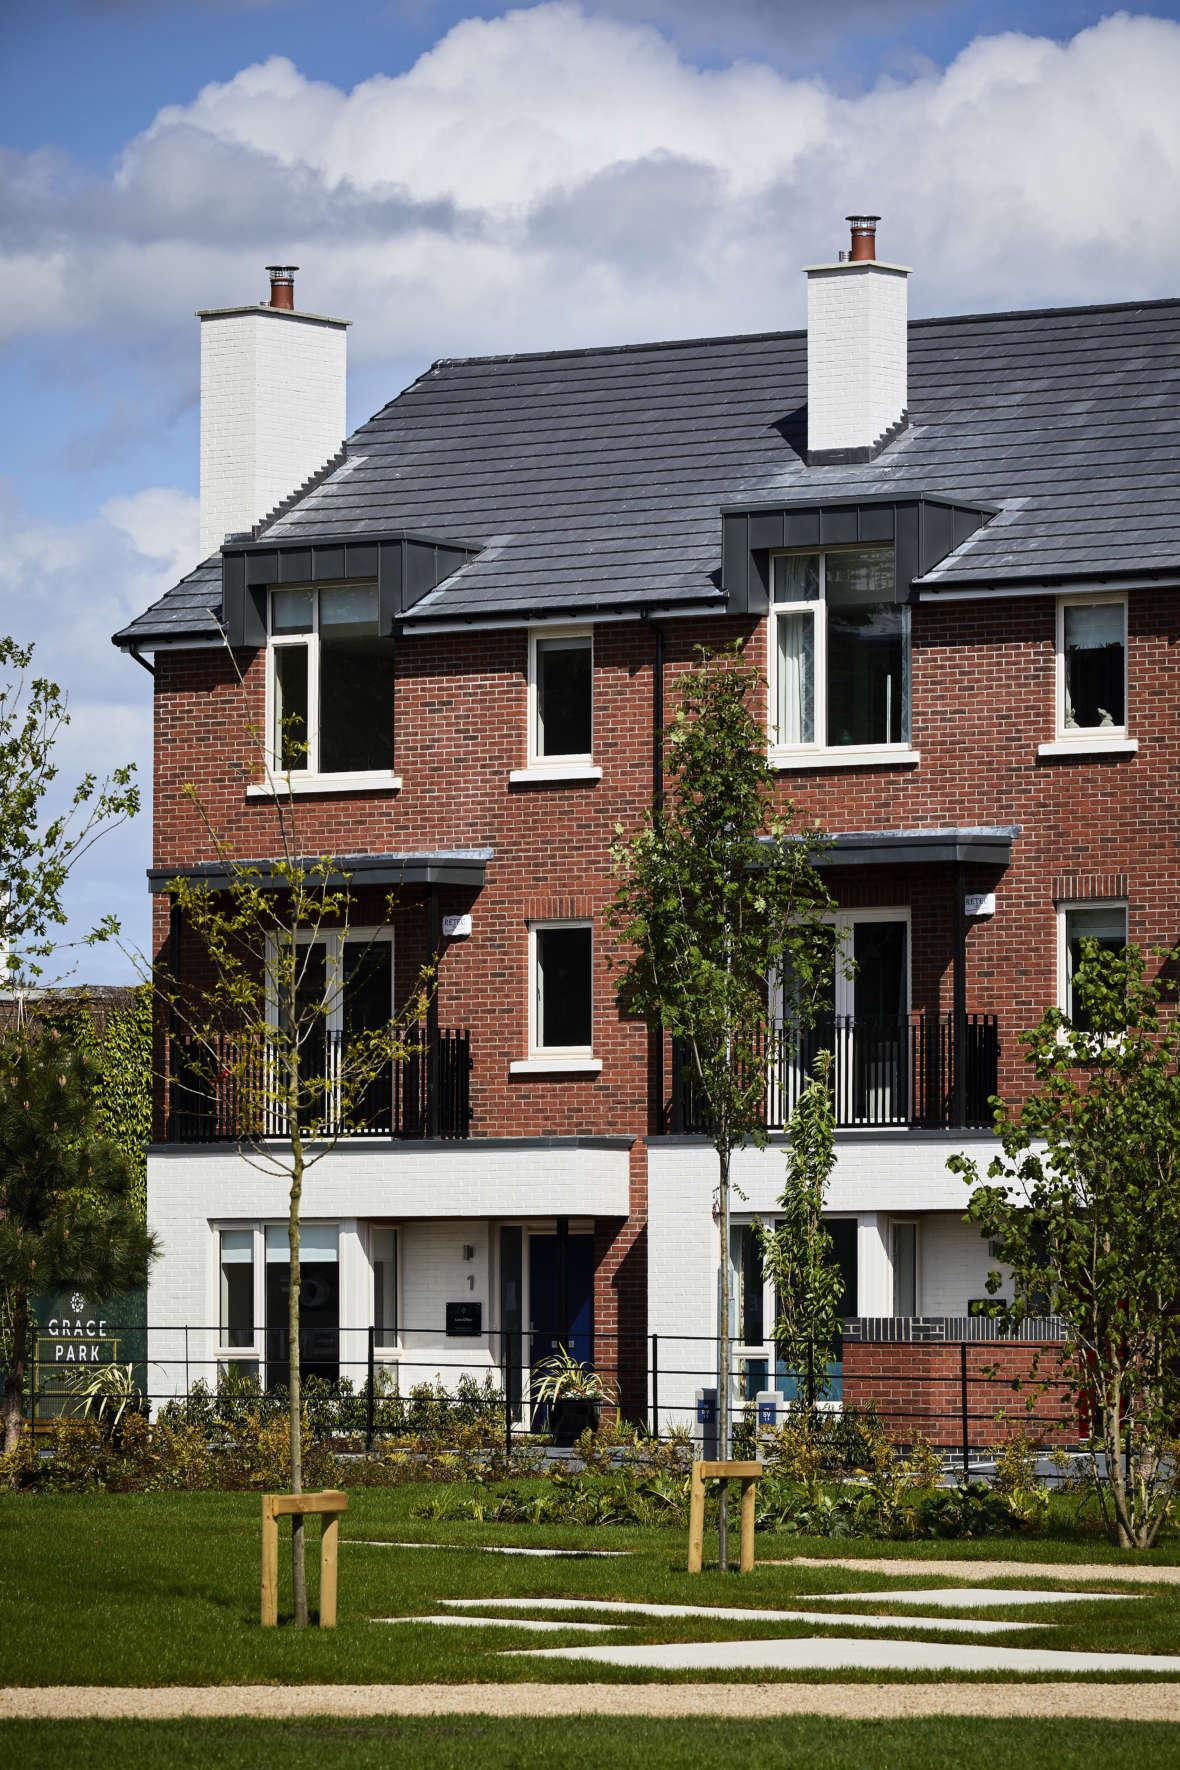 Grace Park Wood 5 bed homes